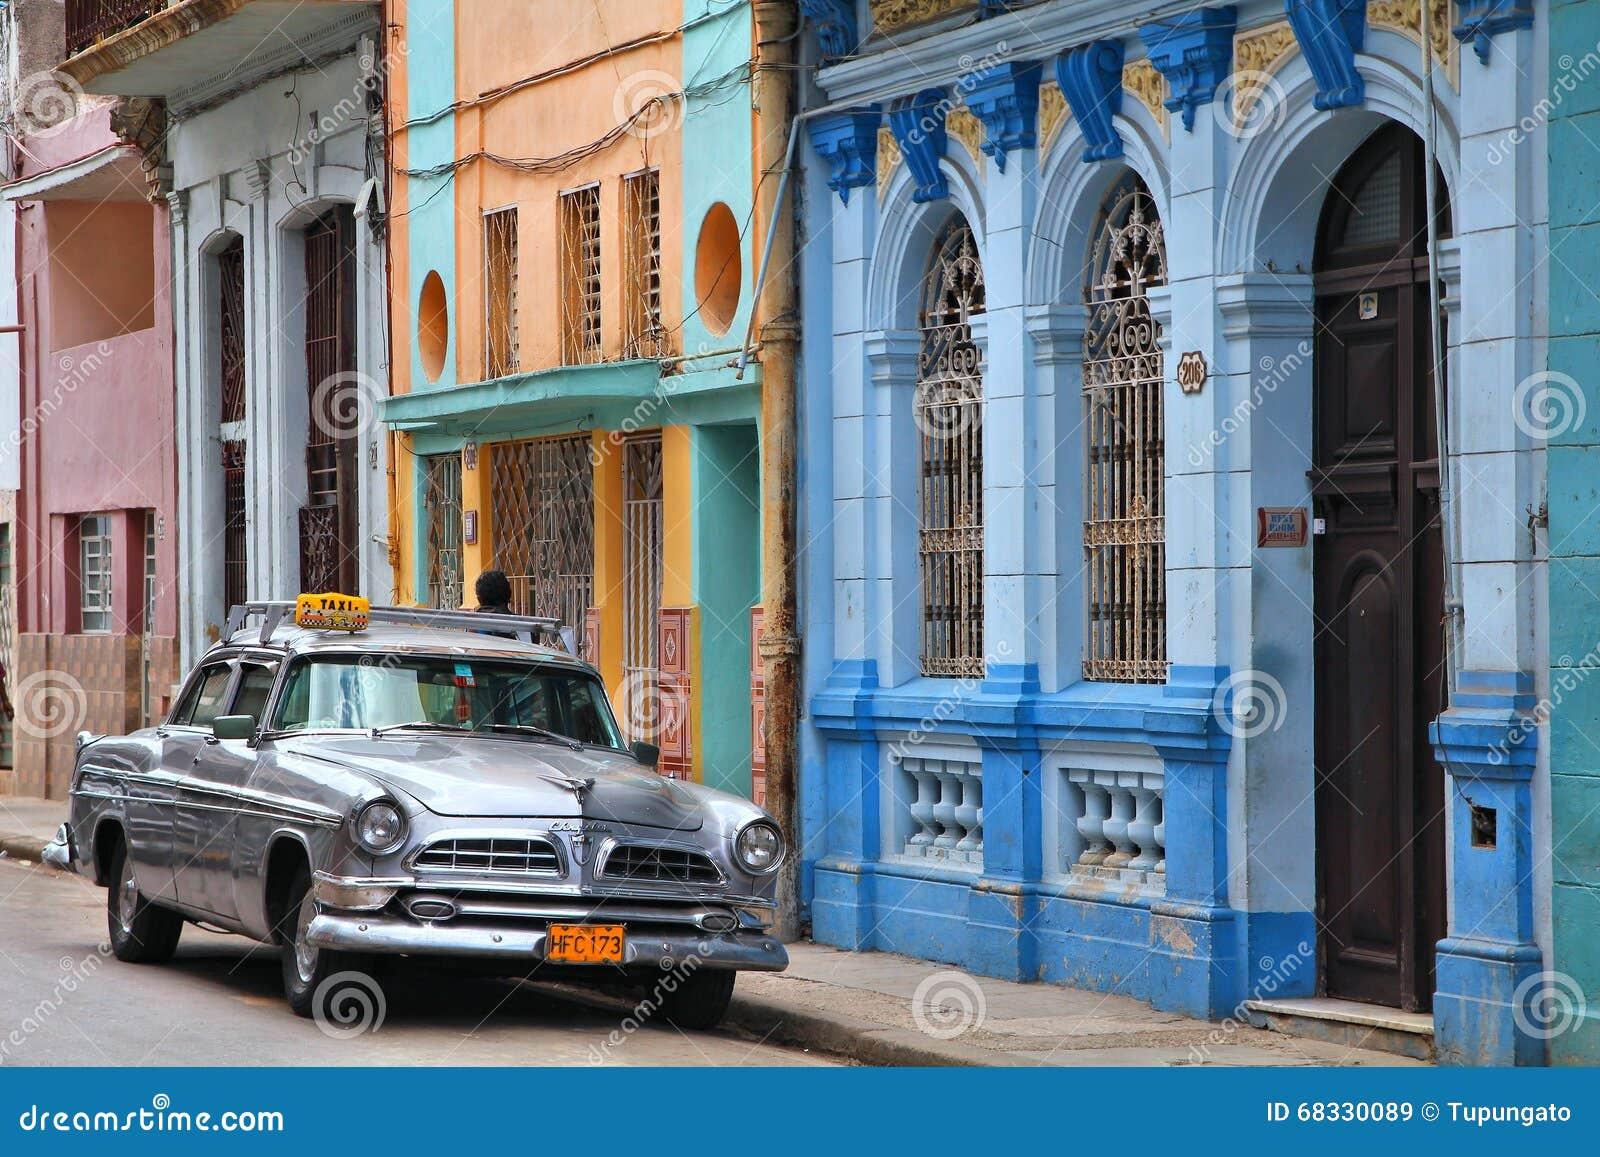 Beautiful Old Car Rates Gallery - Classic Cars Ideas - boiq.info